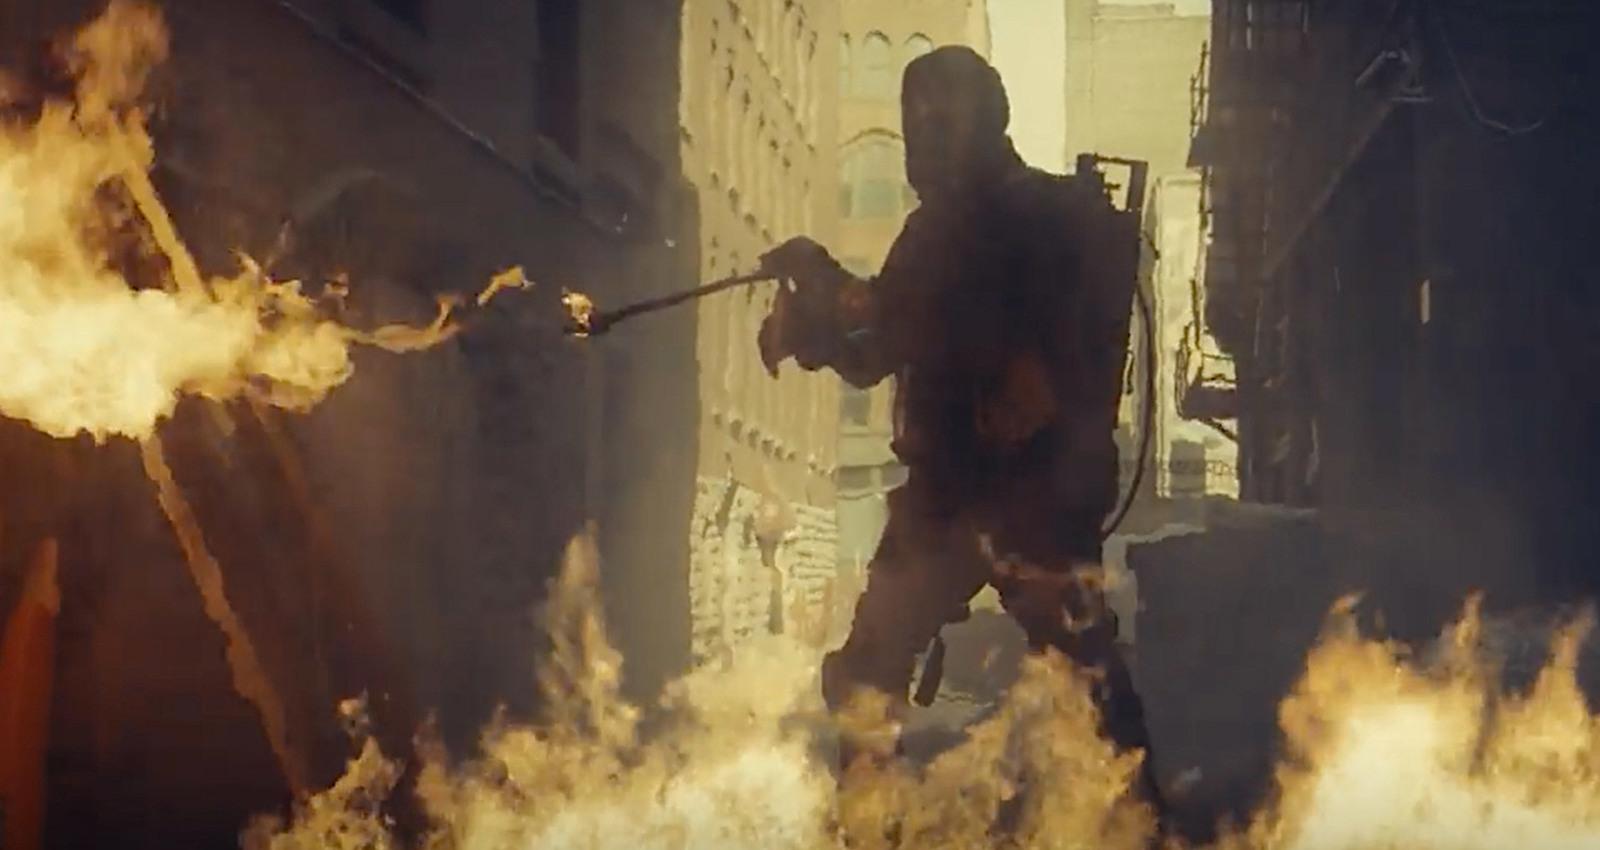 Ubisoft & Branded Entertainment Network (BEN) - Tom Clancy's The Division: Agent Origins